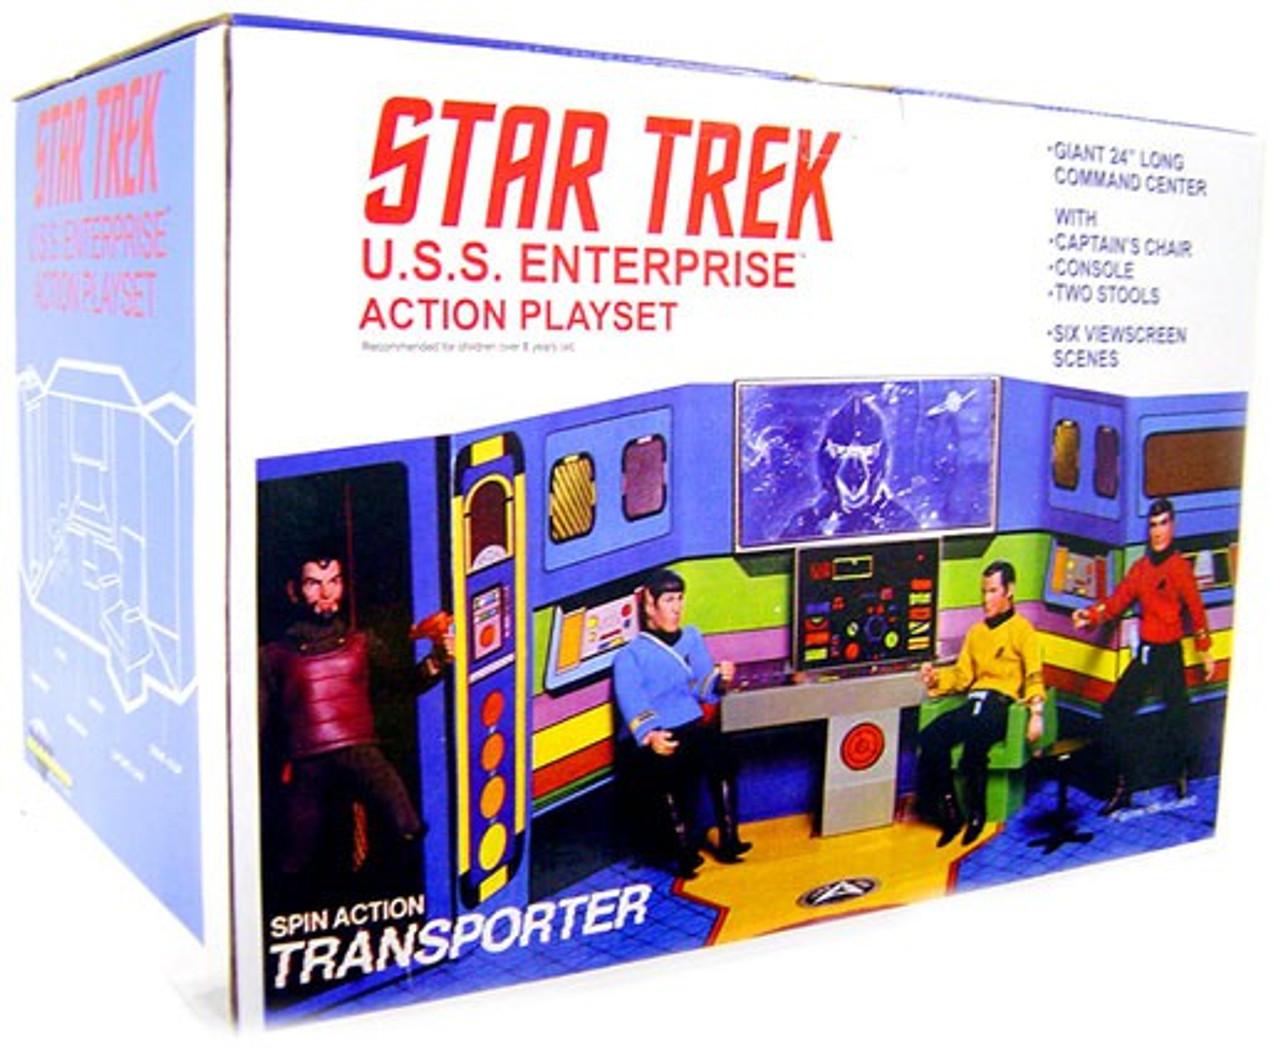 Star Trek The Original Series Cloth Retro Series 1 U S S Enterprise